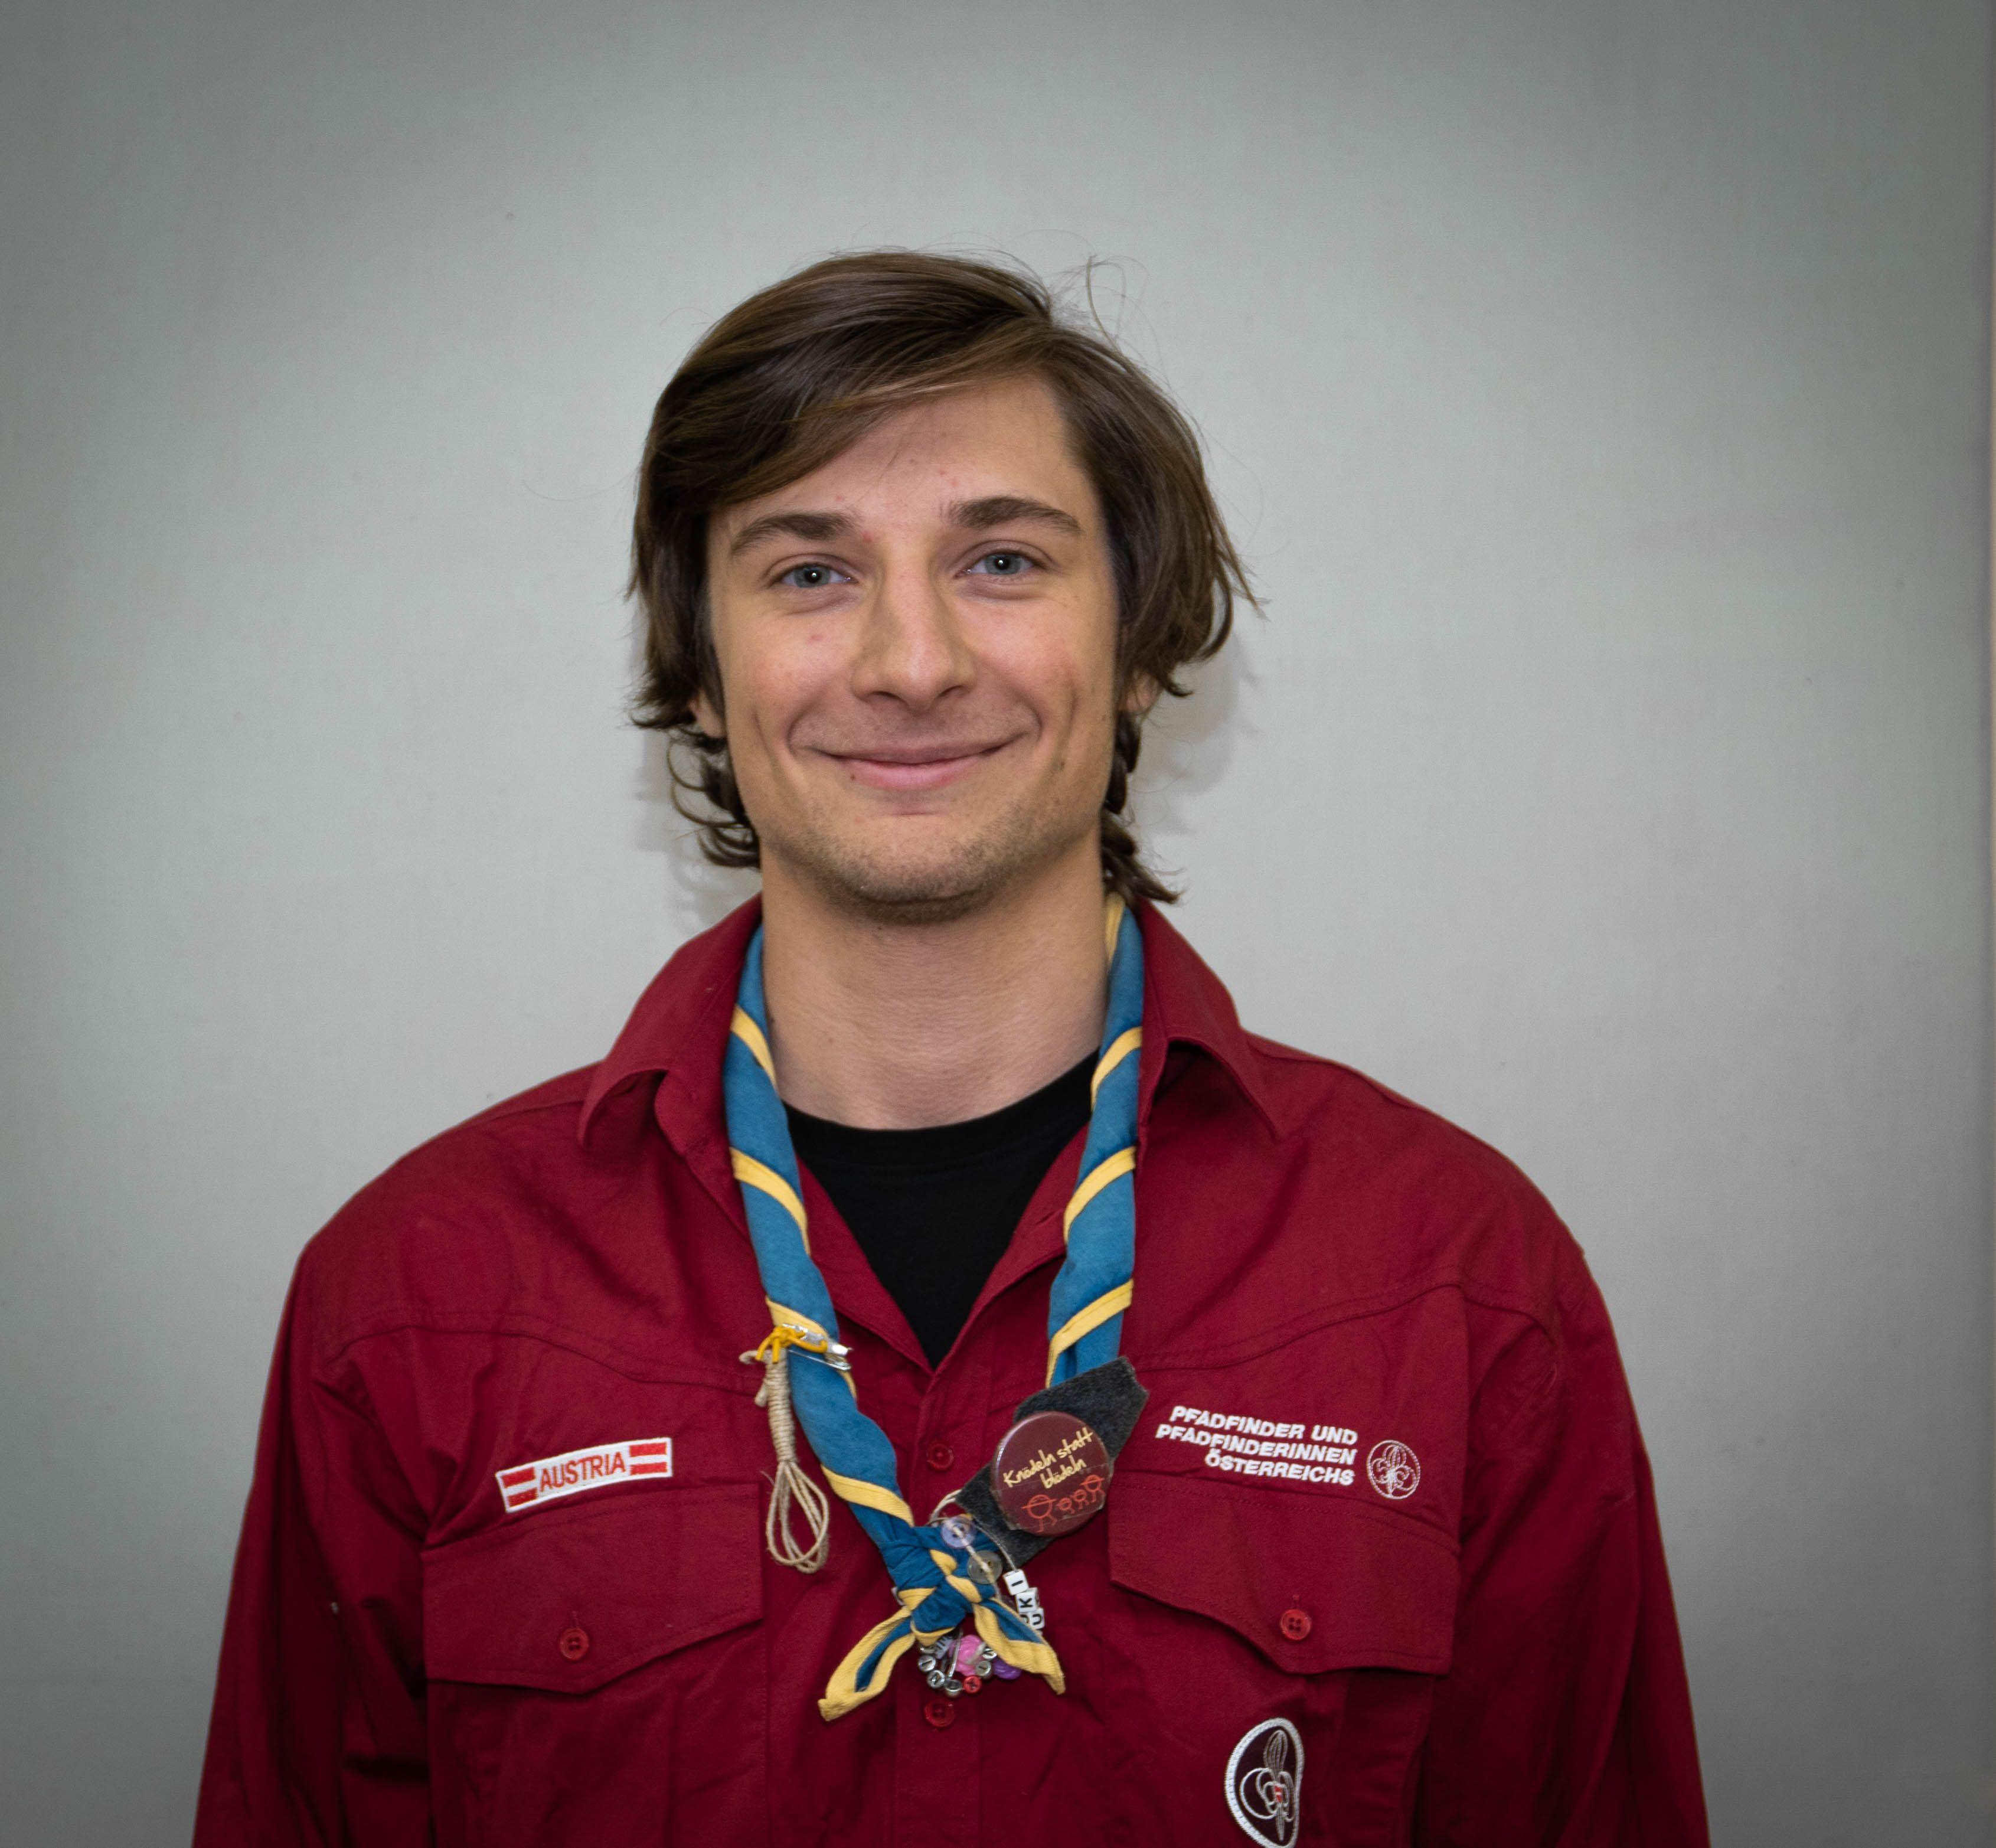 Lukas Heiss